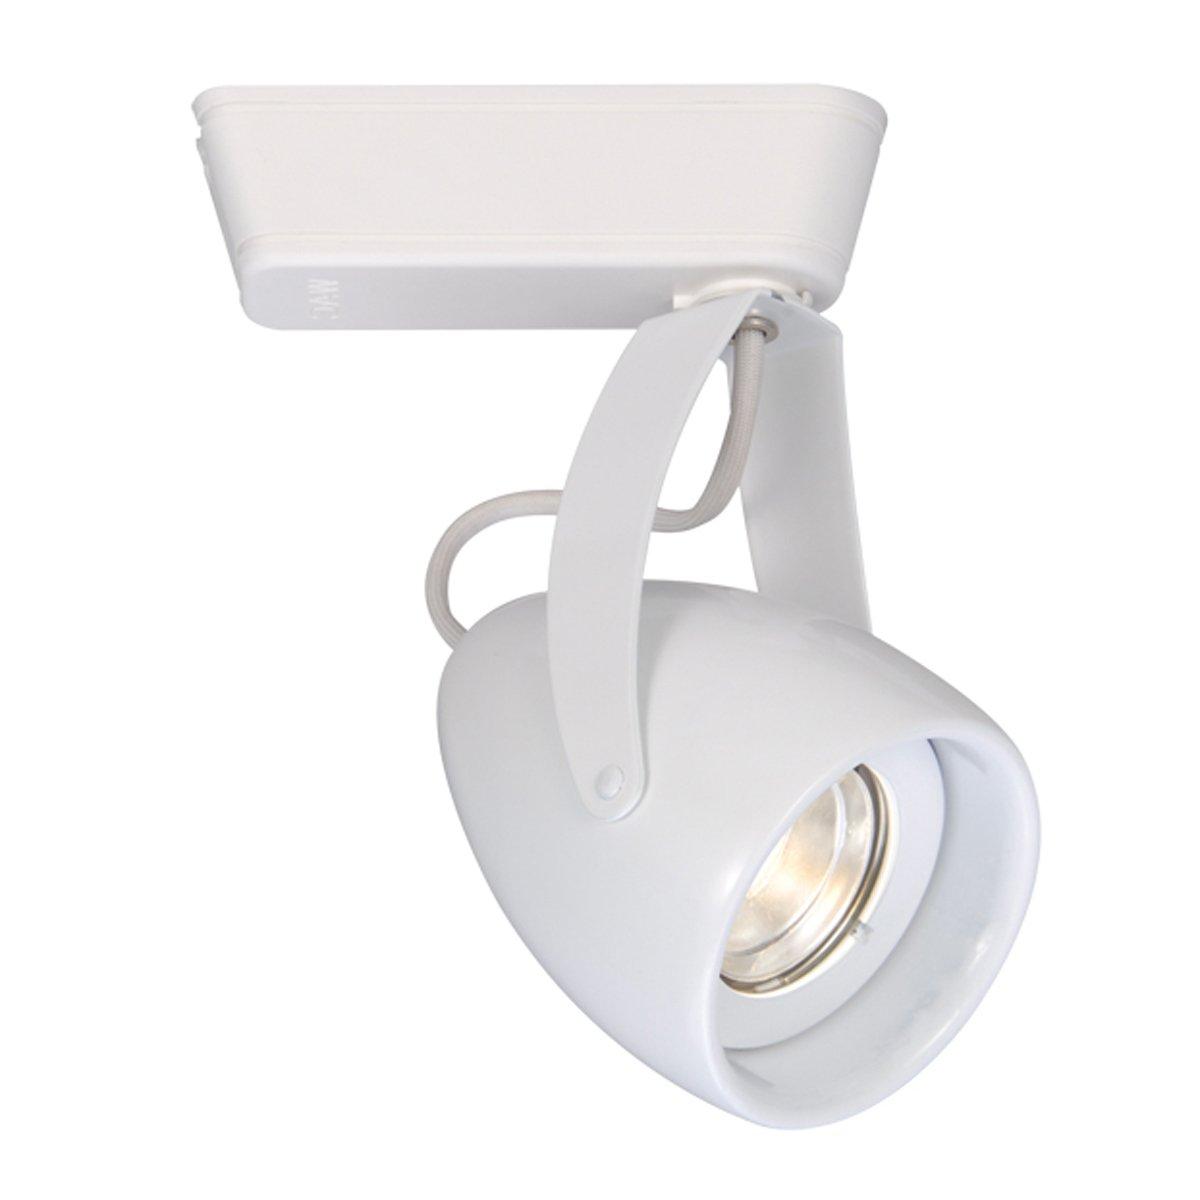 WAC Lighting H-LED820F-40-WT H Series LED820 Impulse LED Low Voltage Track Head in White Finish, Flood Beam, 4000K